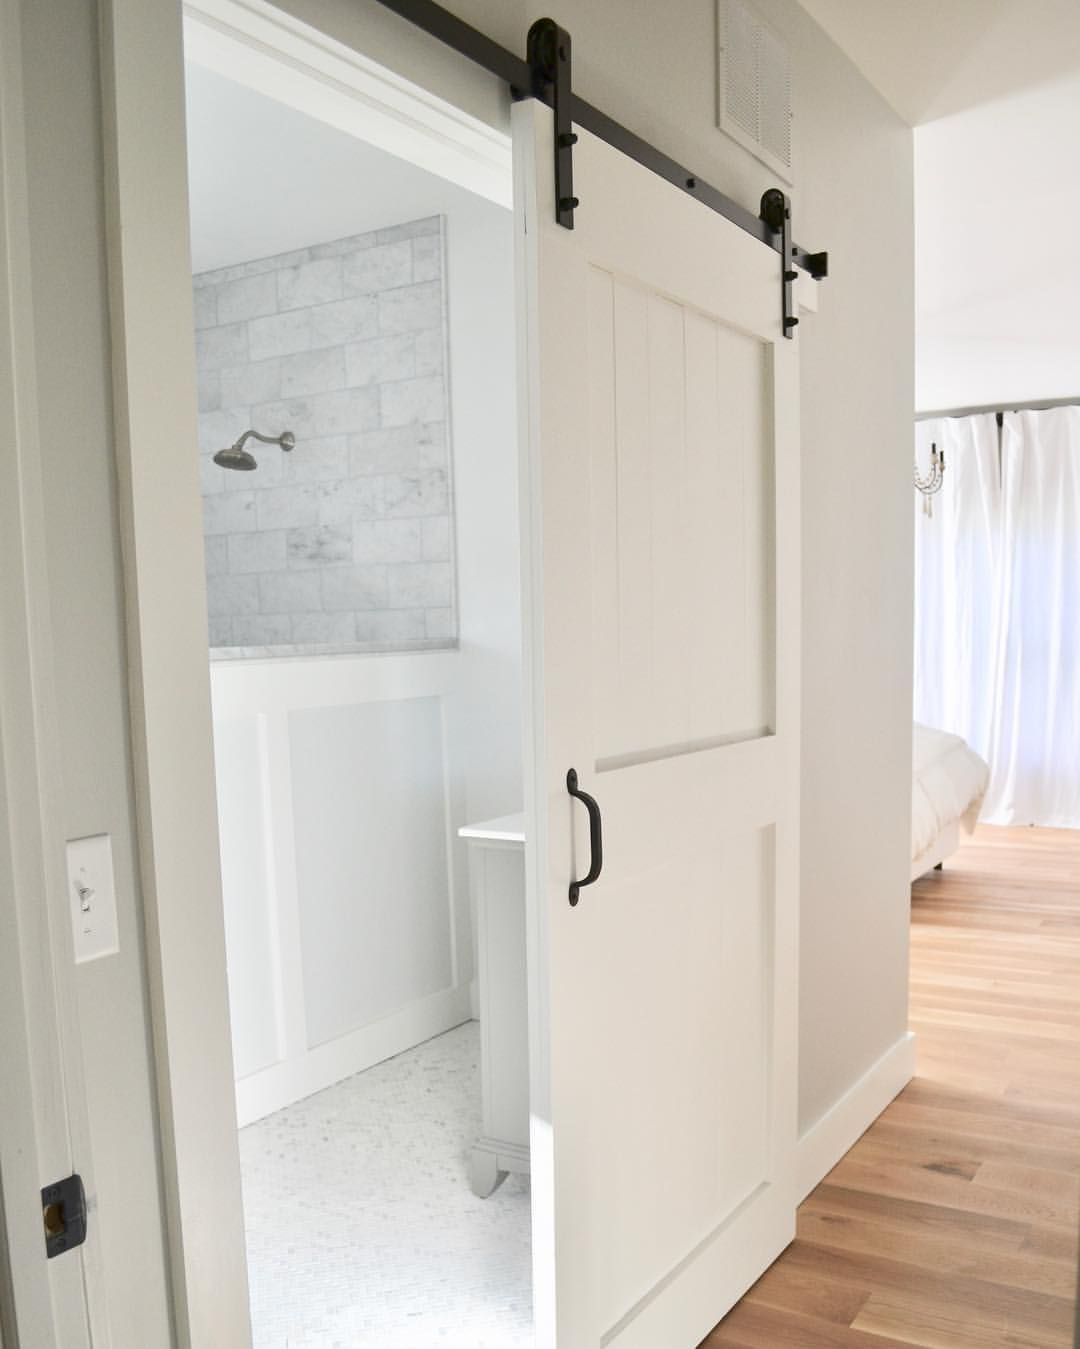 25.SIMPHOME.COM fascinating closet door ideas suggestions for modern home design